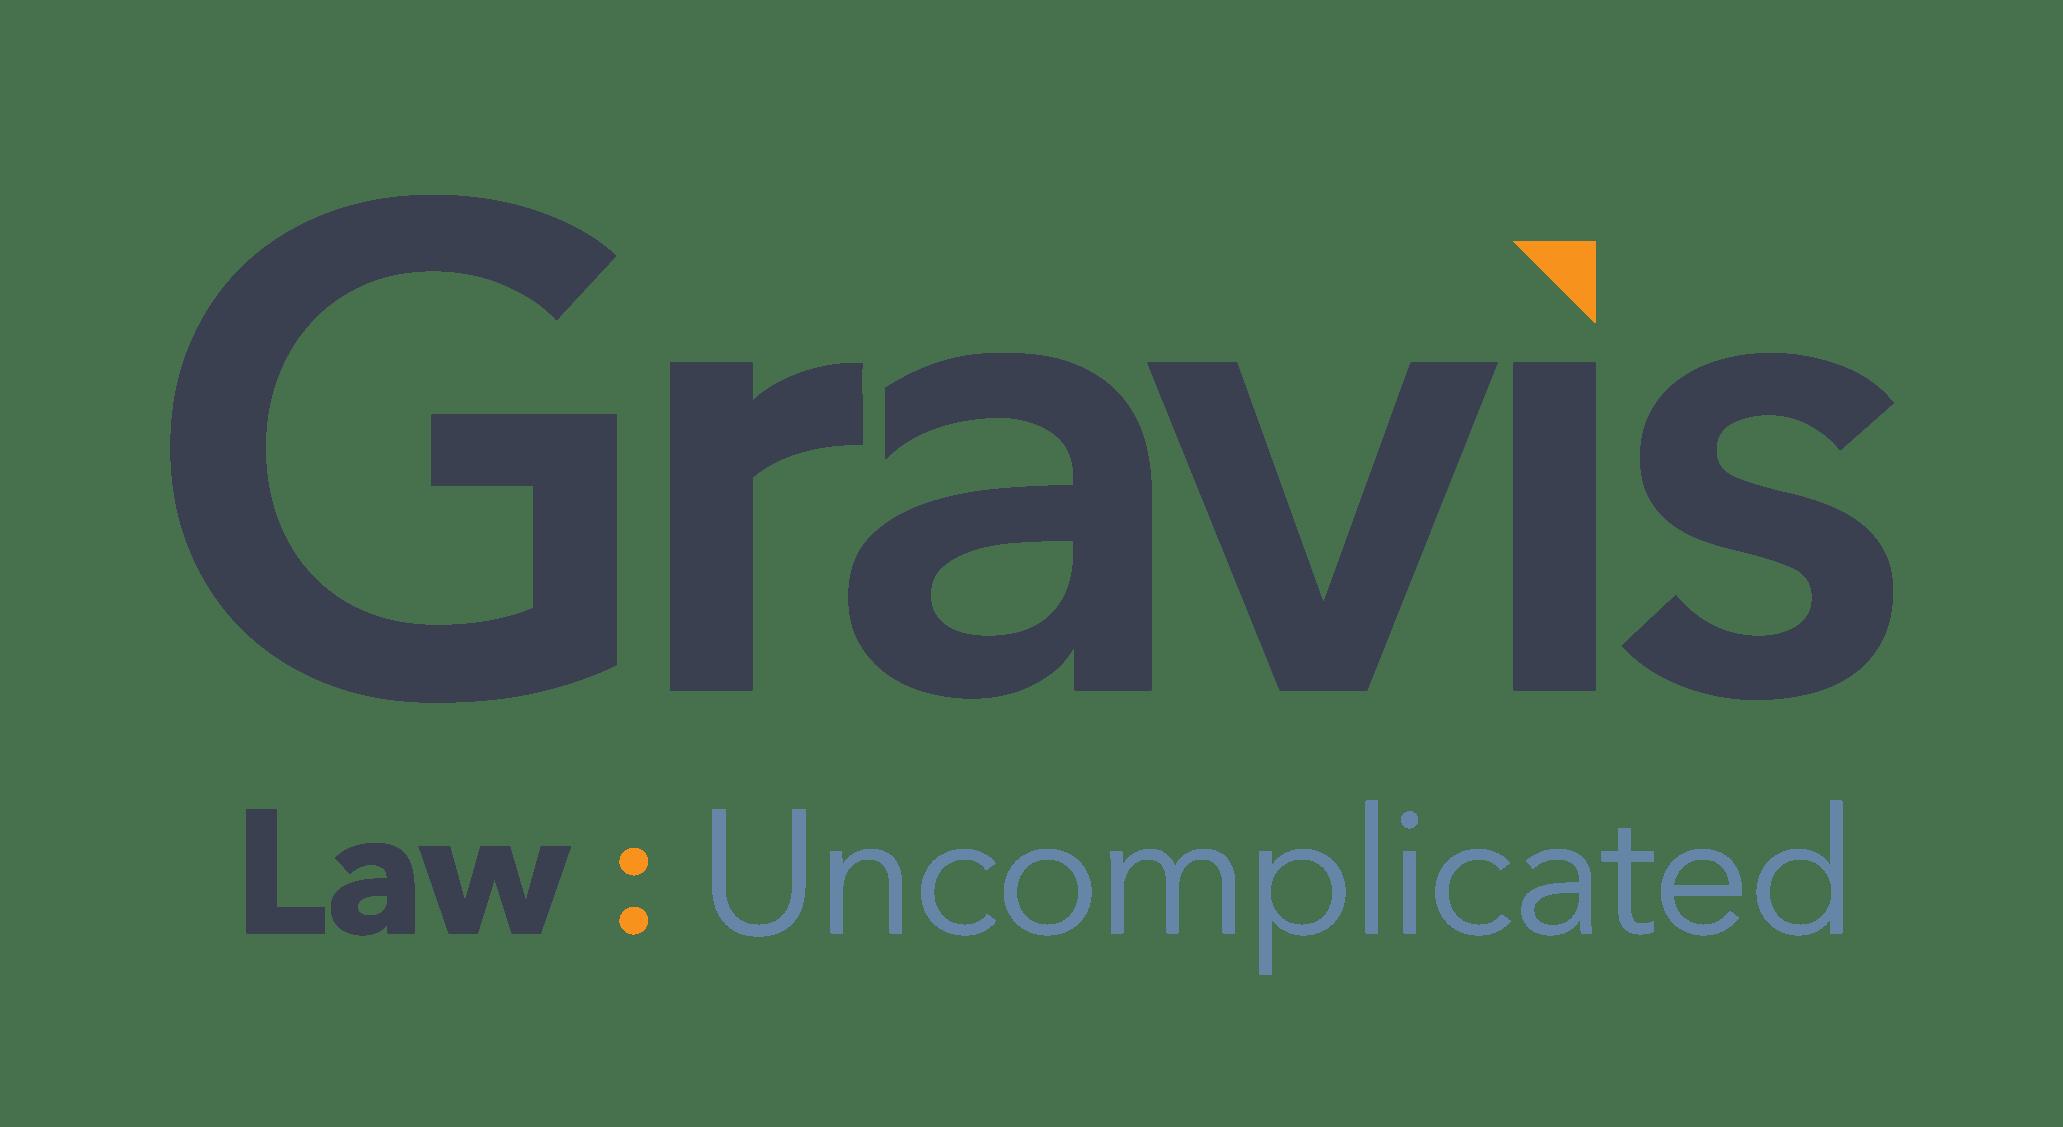 Gravis-All-Logos-for-Web_Gravis-single-color-tag